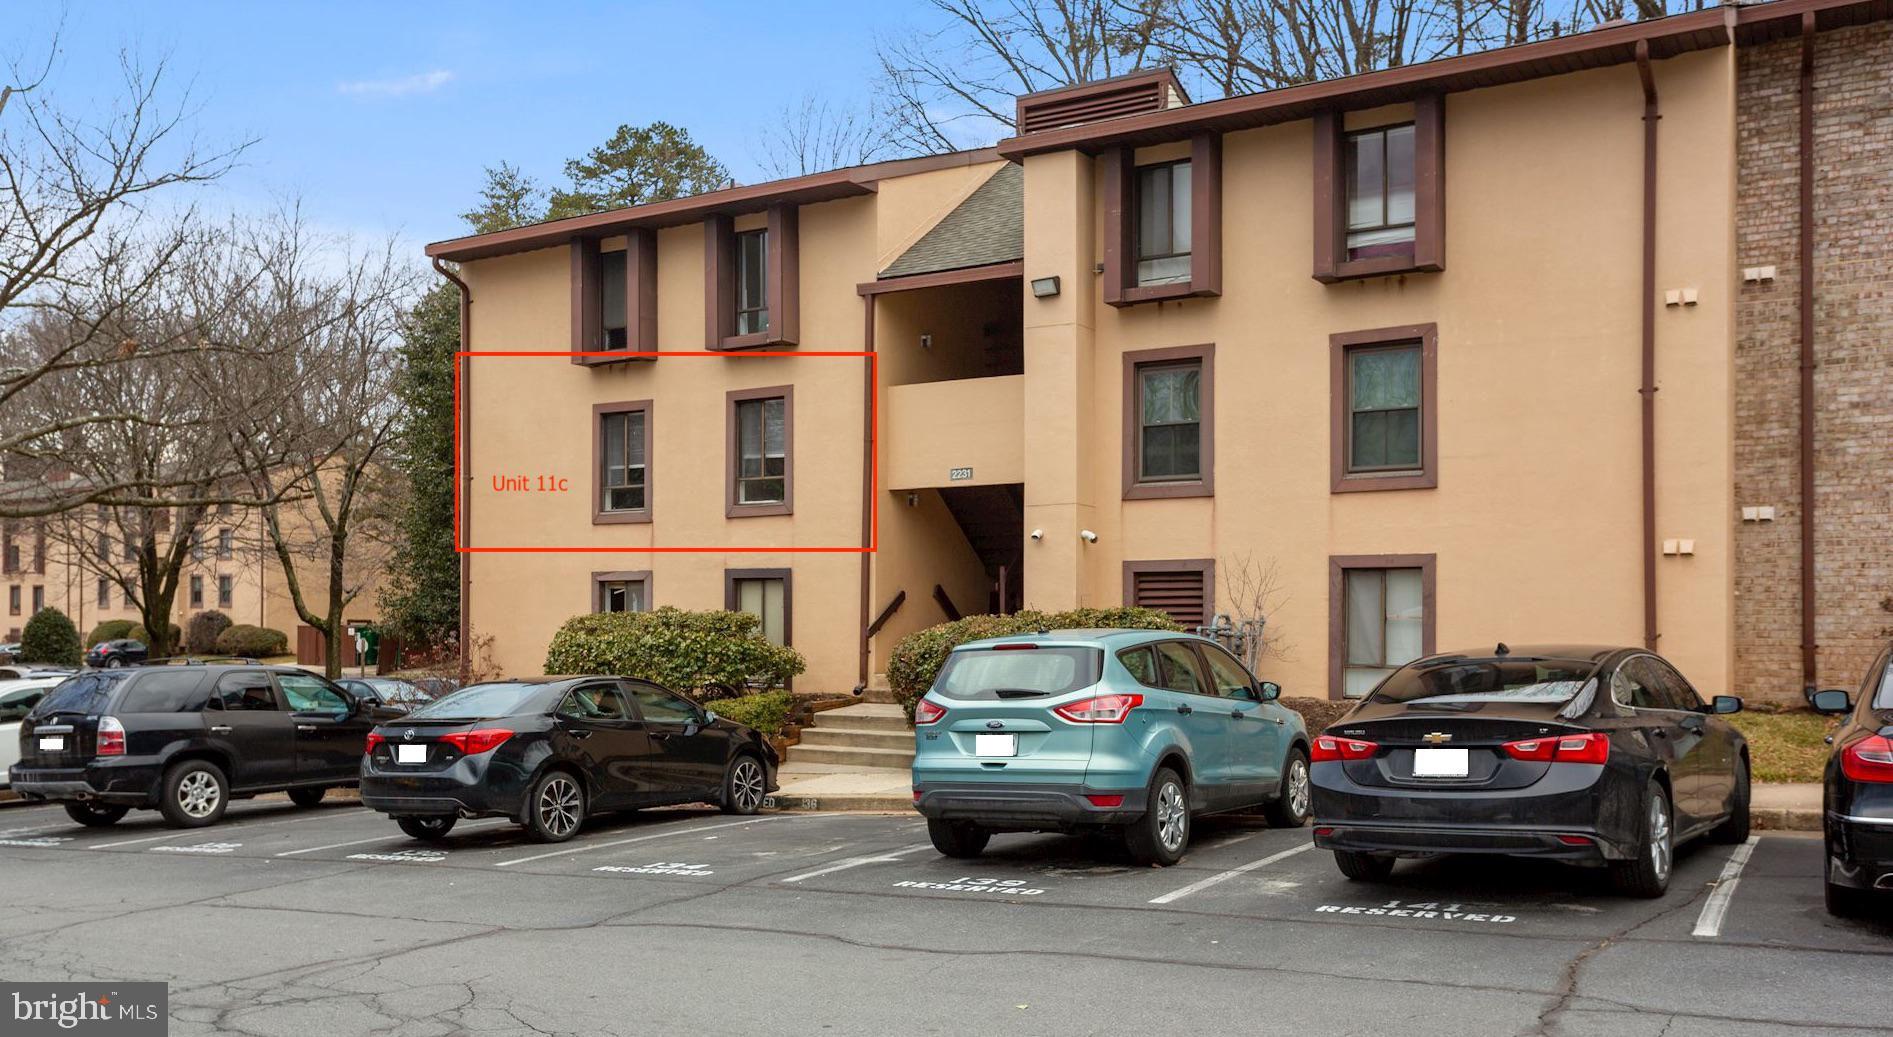 Another Property Sold - 2231 Castle Rock Square #11C, Reston, VA 20191